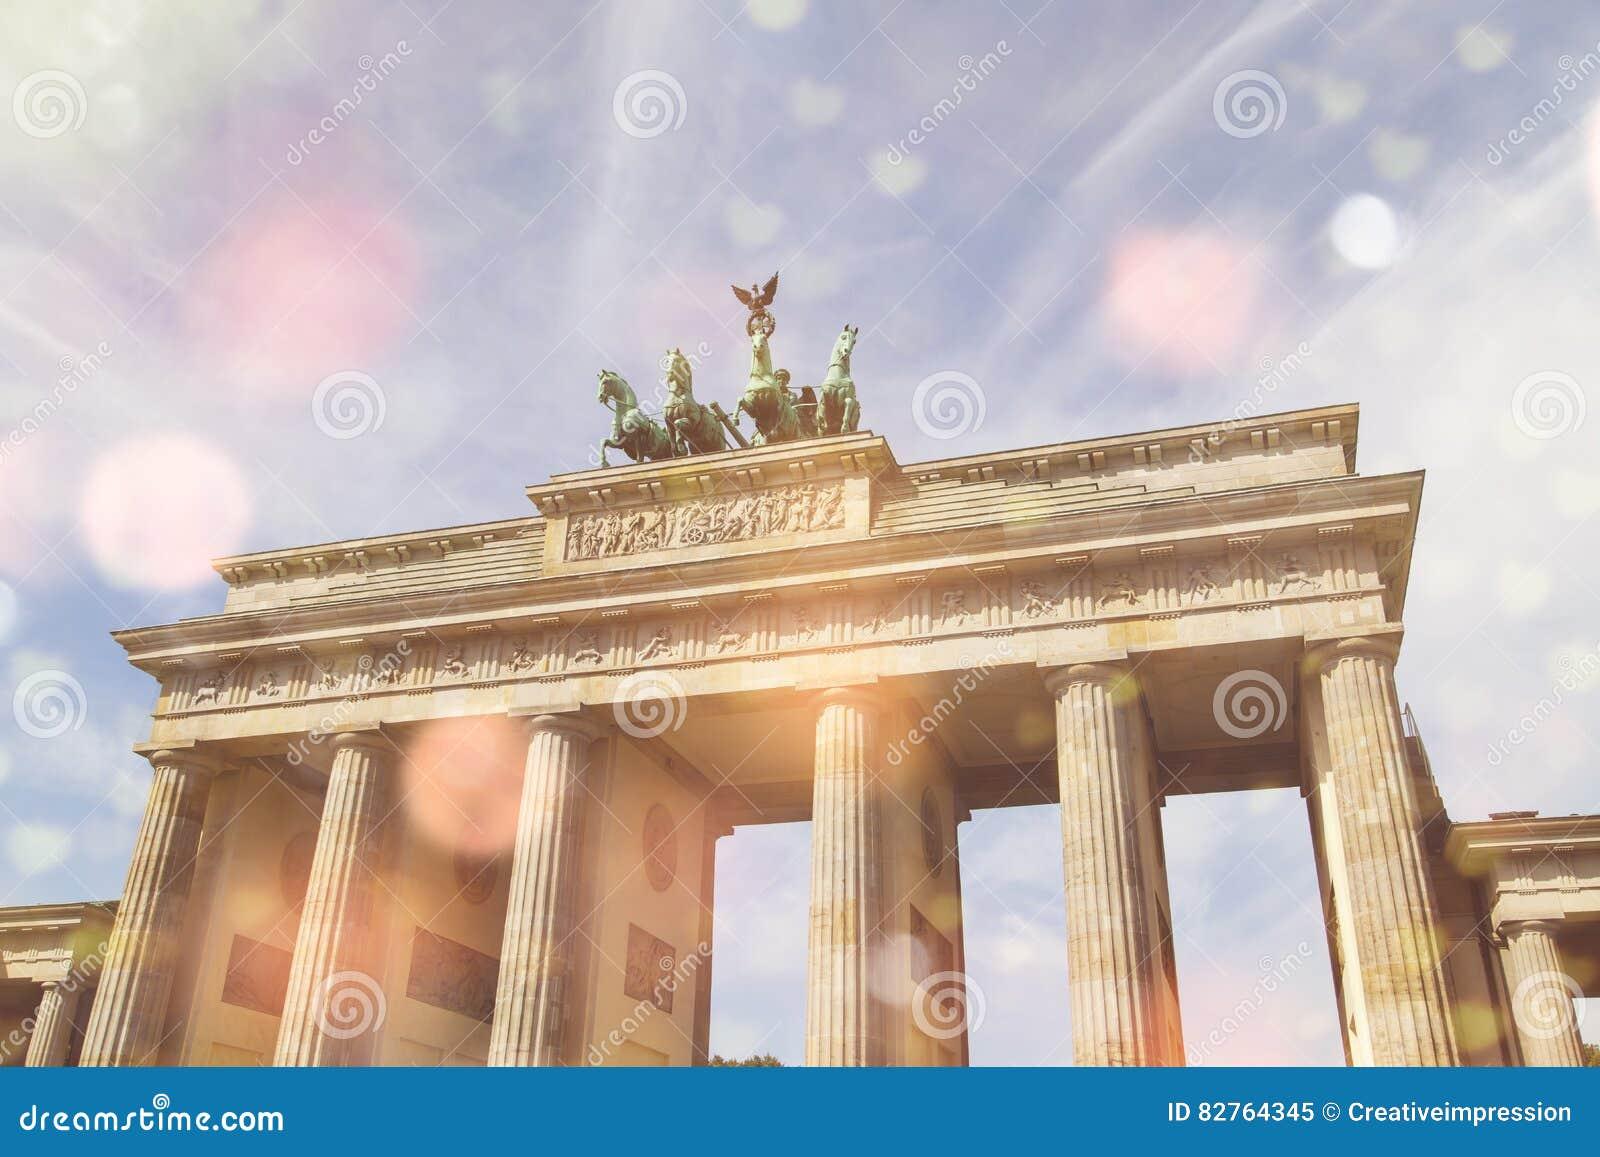 Brandenburger gate and lighteffects